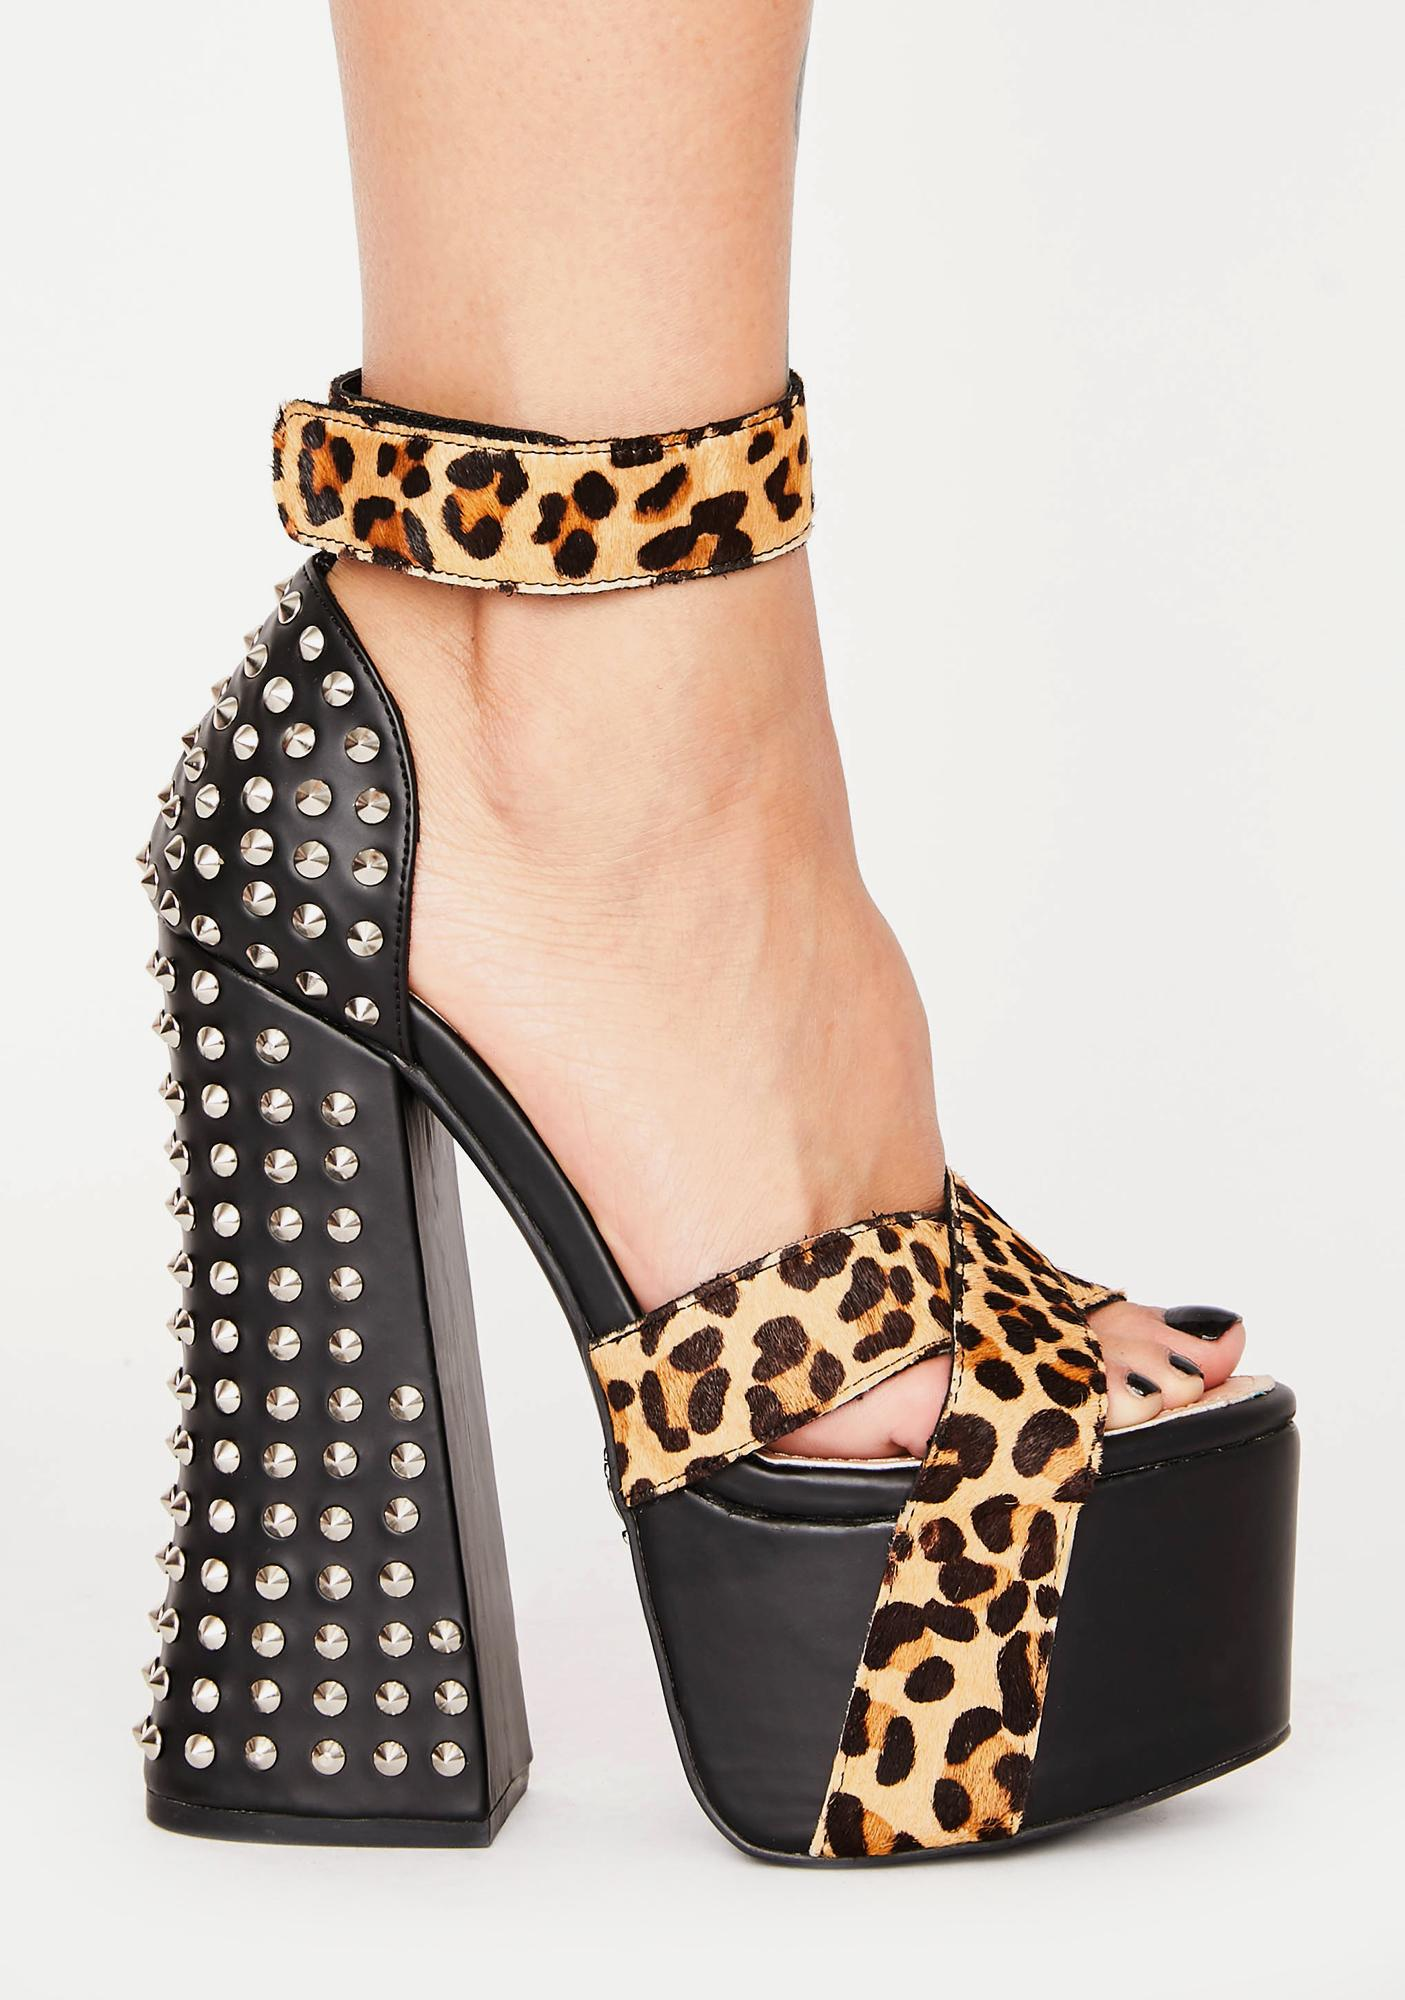 Charla Tedrick Bowery Leopard Platform Heels